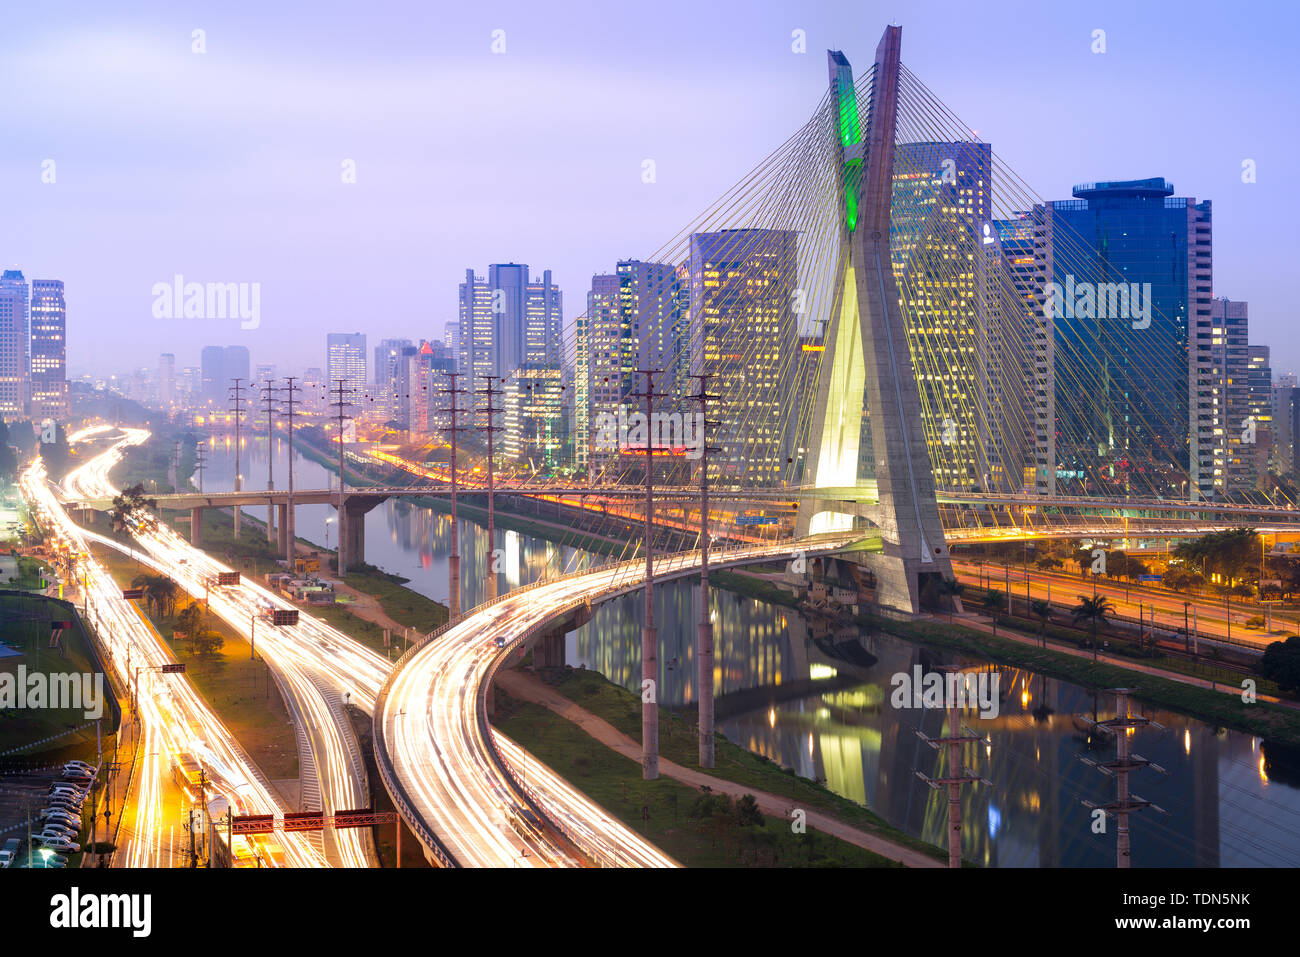 Skyline di Sao Paulo di notte, Brasile Immagini Stock